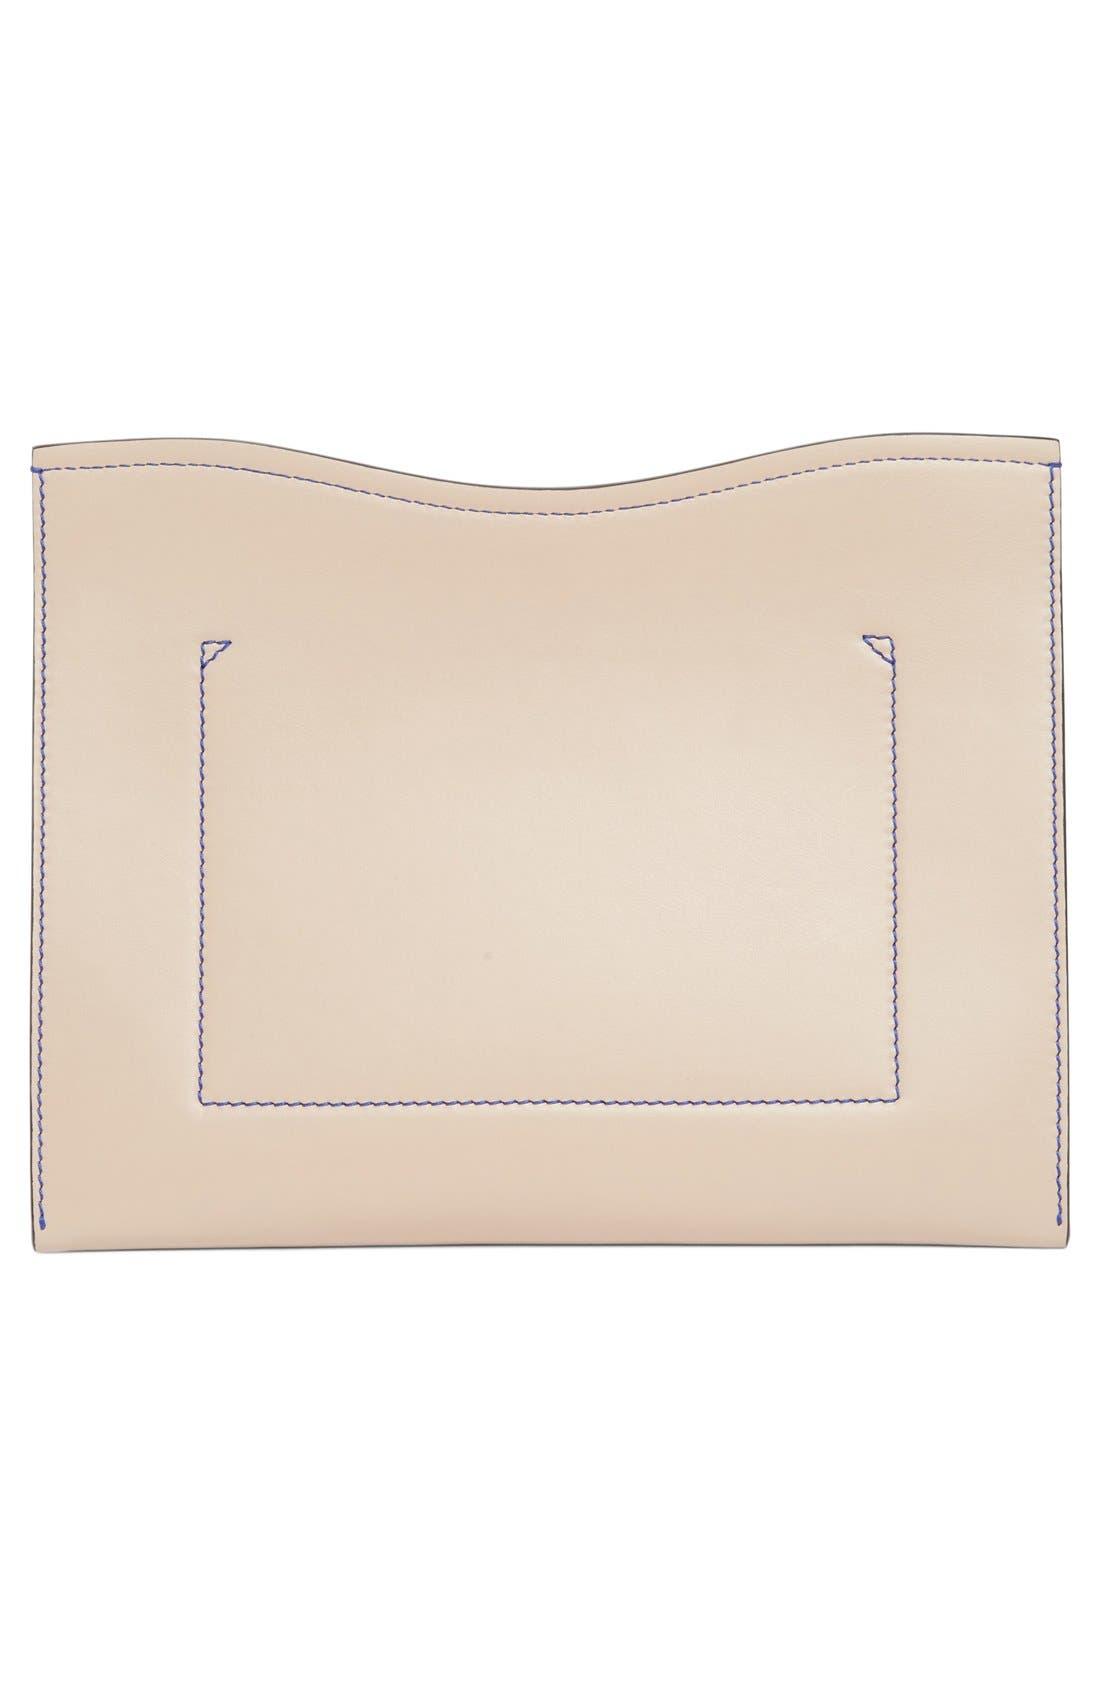 Medium Calfskin Leather Clutch,                             Alternate thumbnail 5, color,                             250